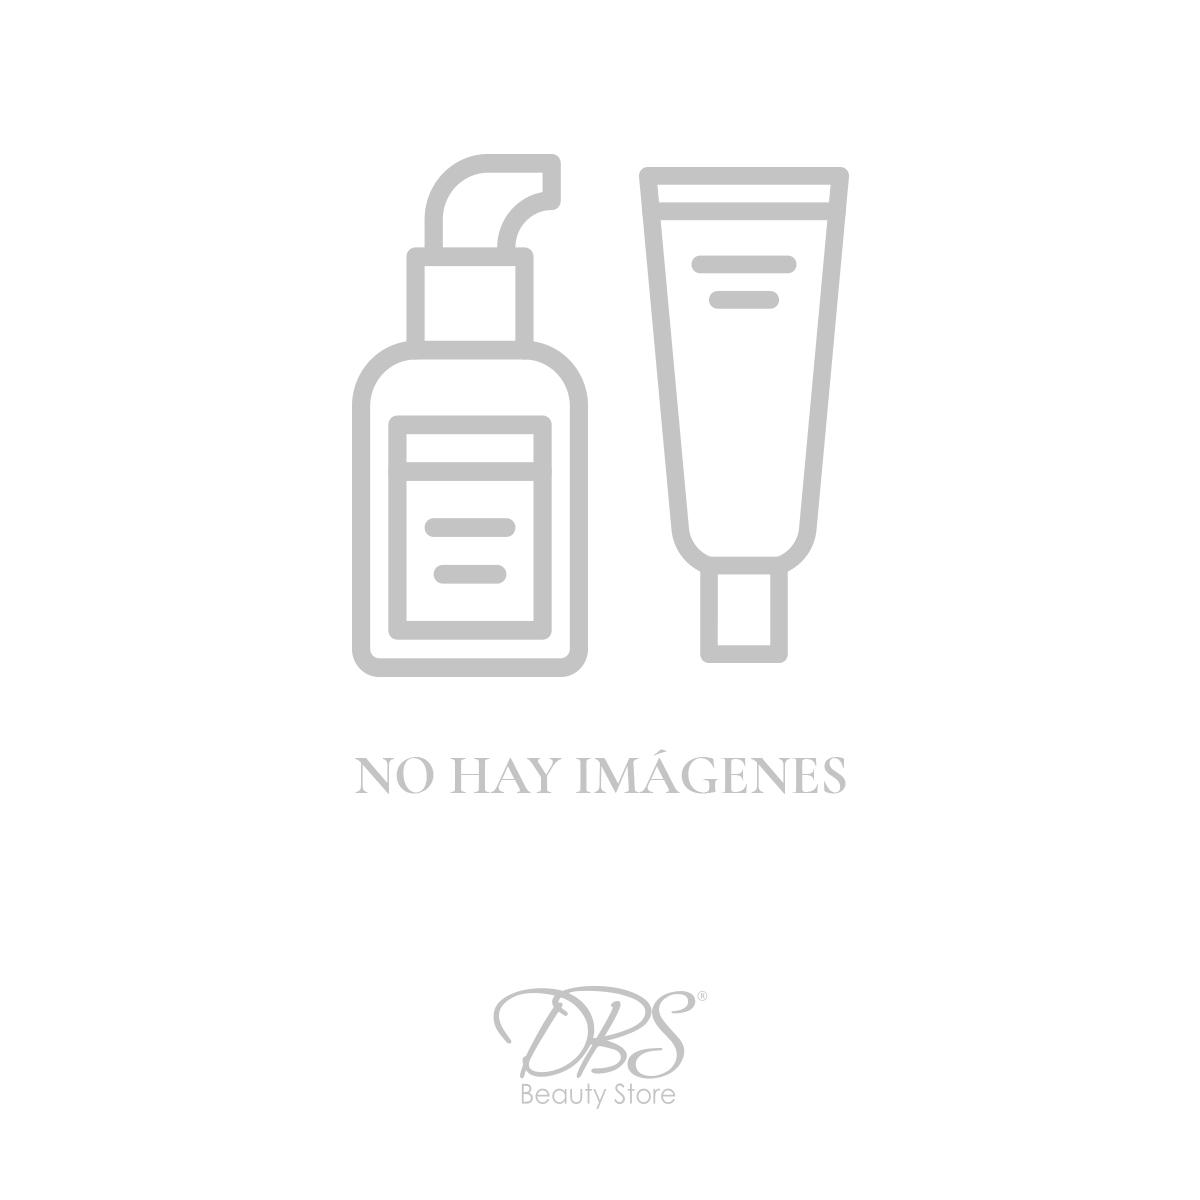 body-luxuries-BL-XC1822-MP.jpg